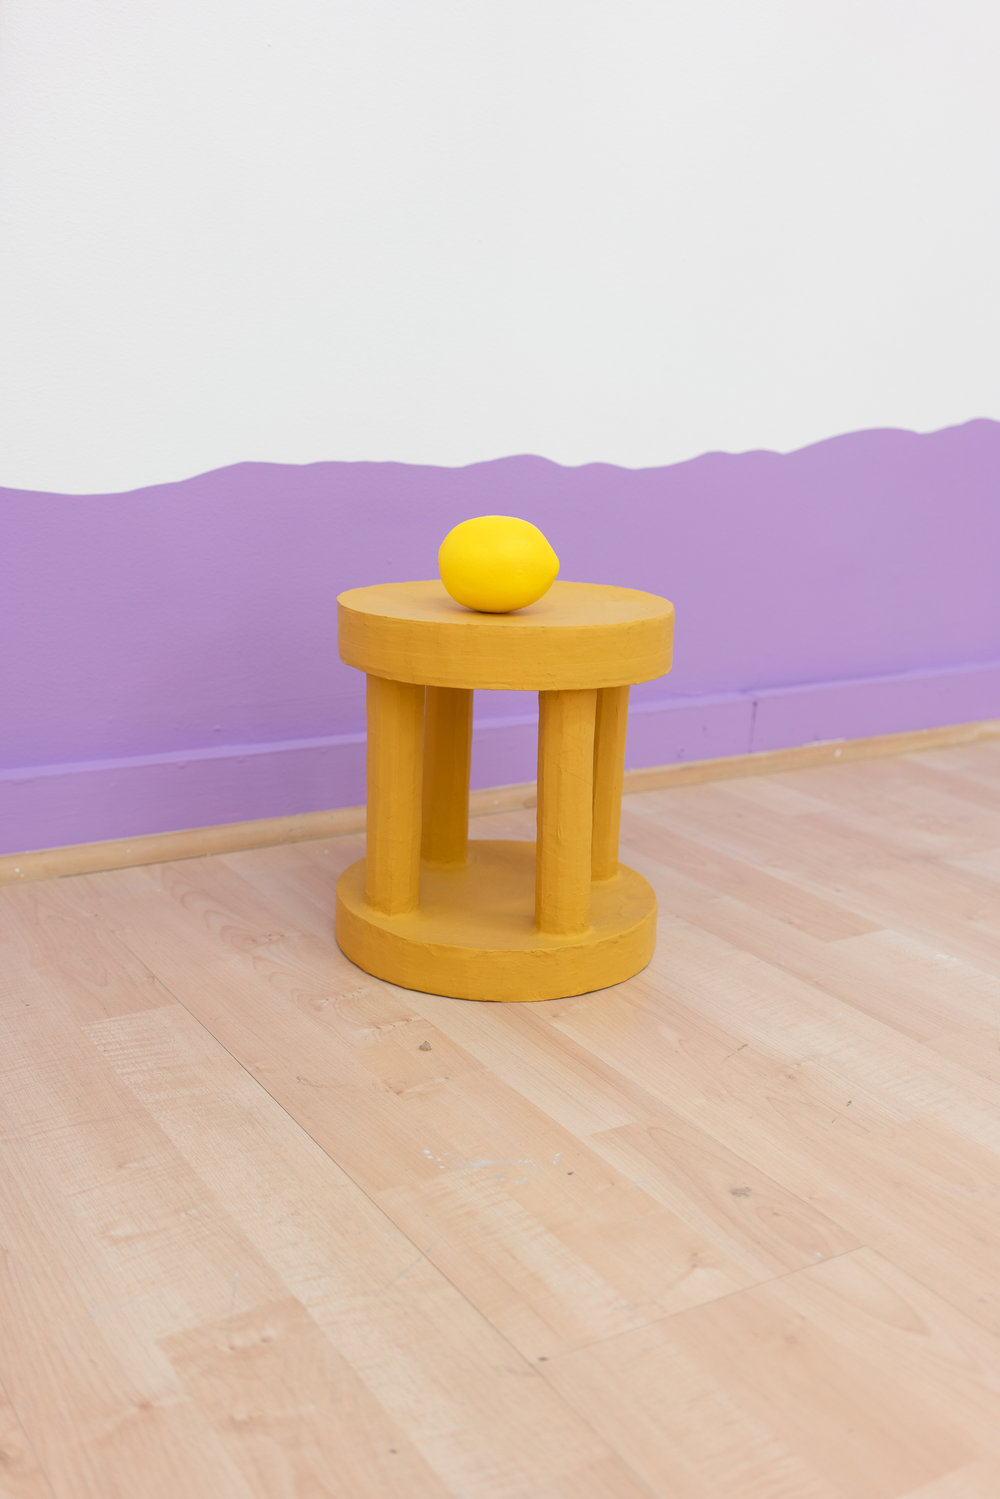 Sarah Hotchkiss,  Lemon Ped , 2018, Cardboard, papier-mâché, gouache, 13 x 9 x 9 in.